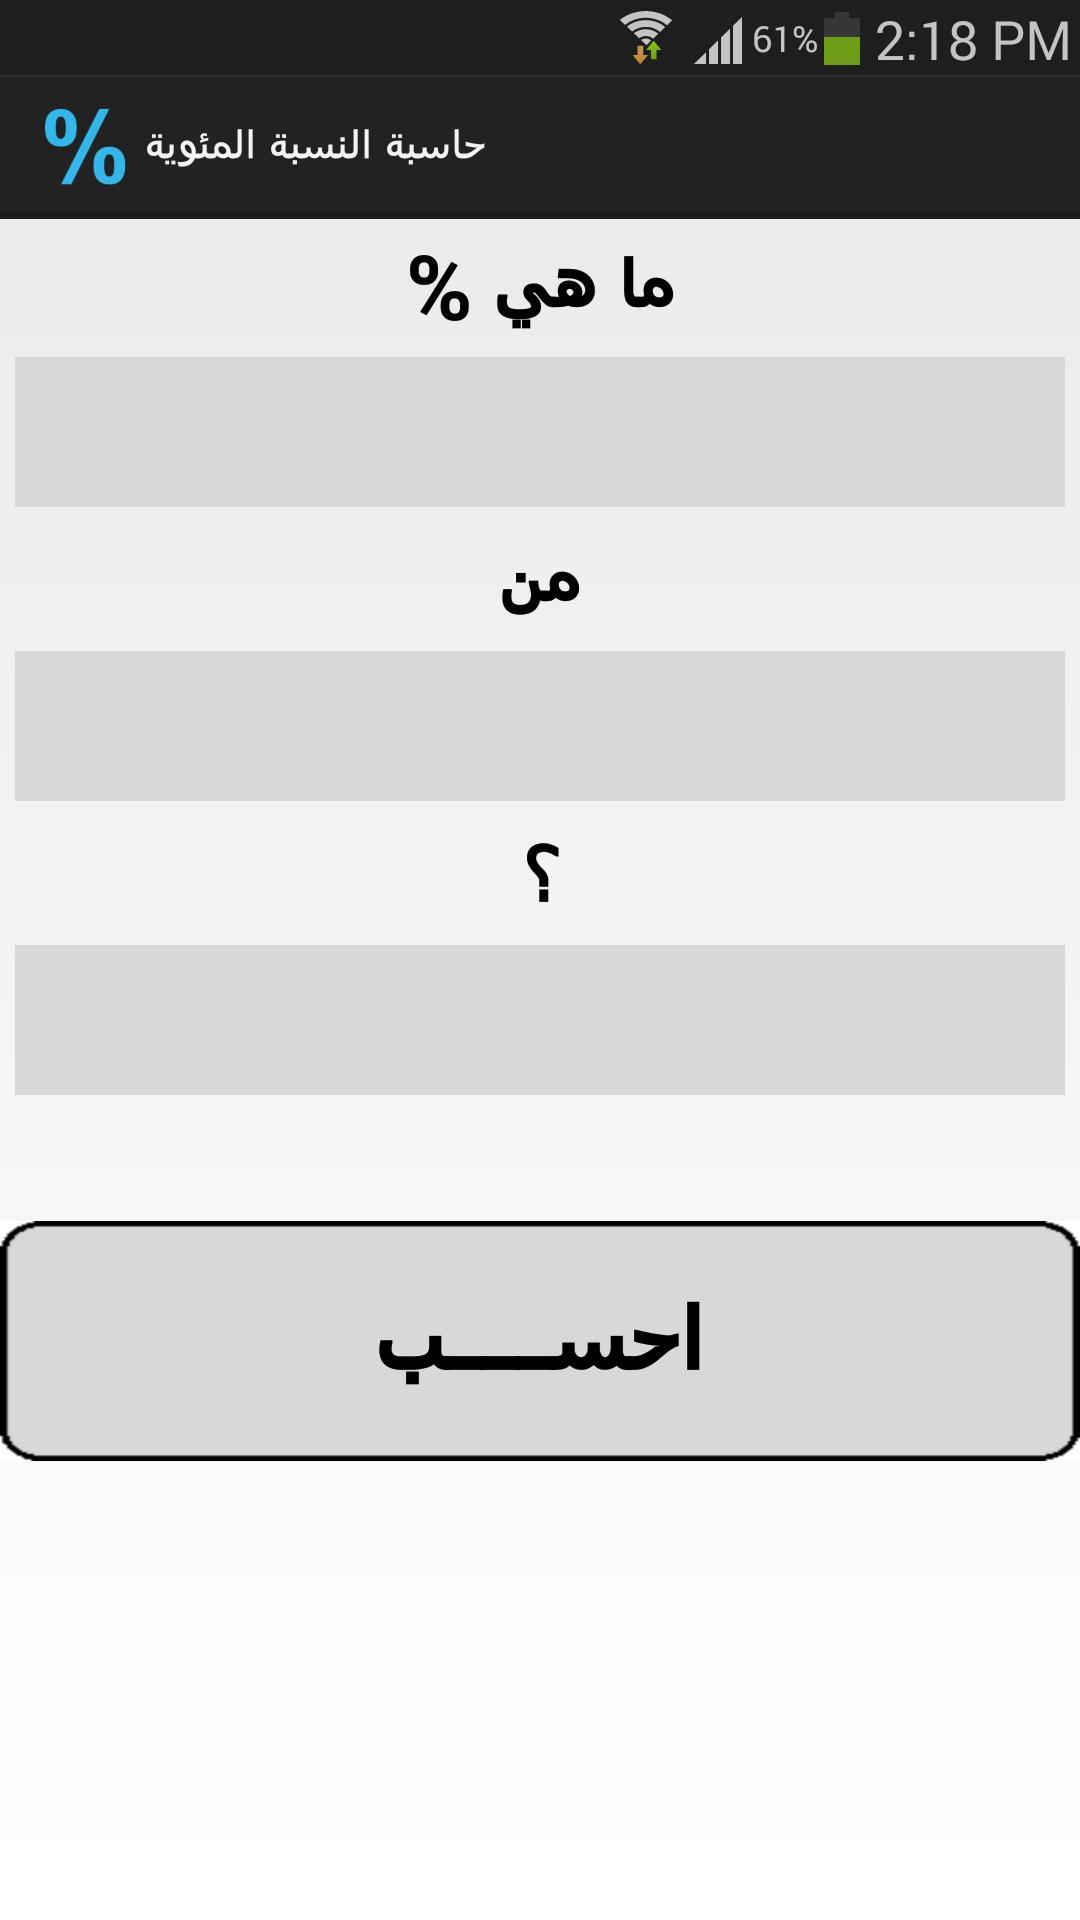 برنامج لحساب نسبة مئوية For Android Apk Download